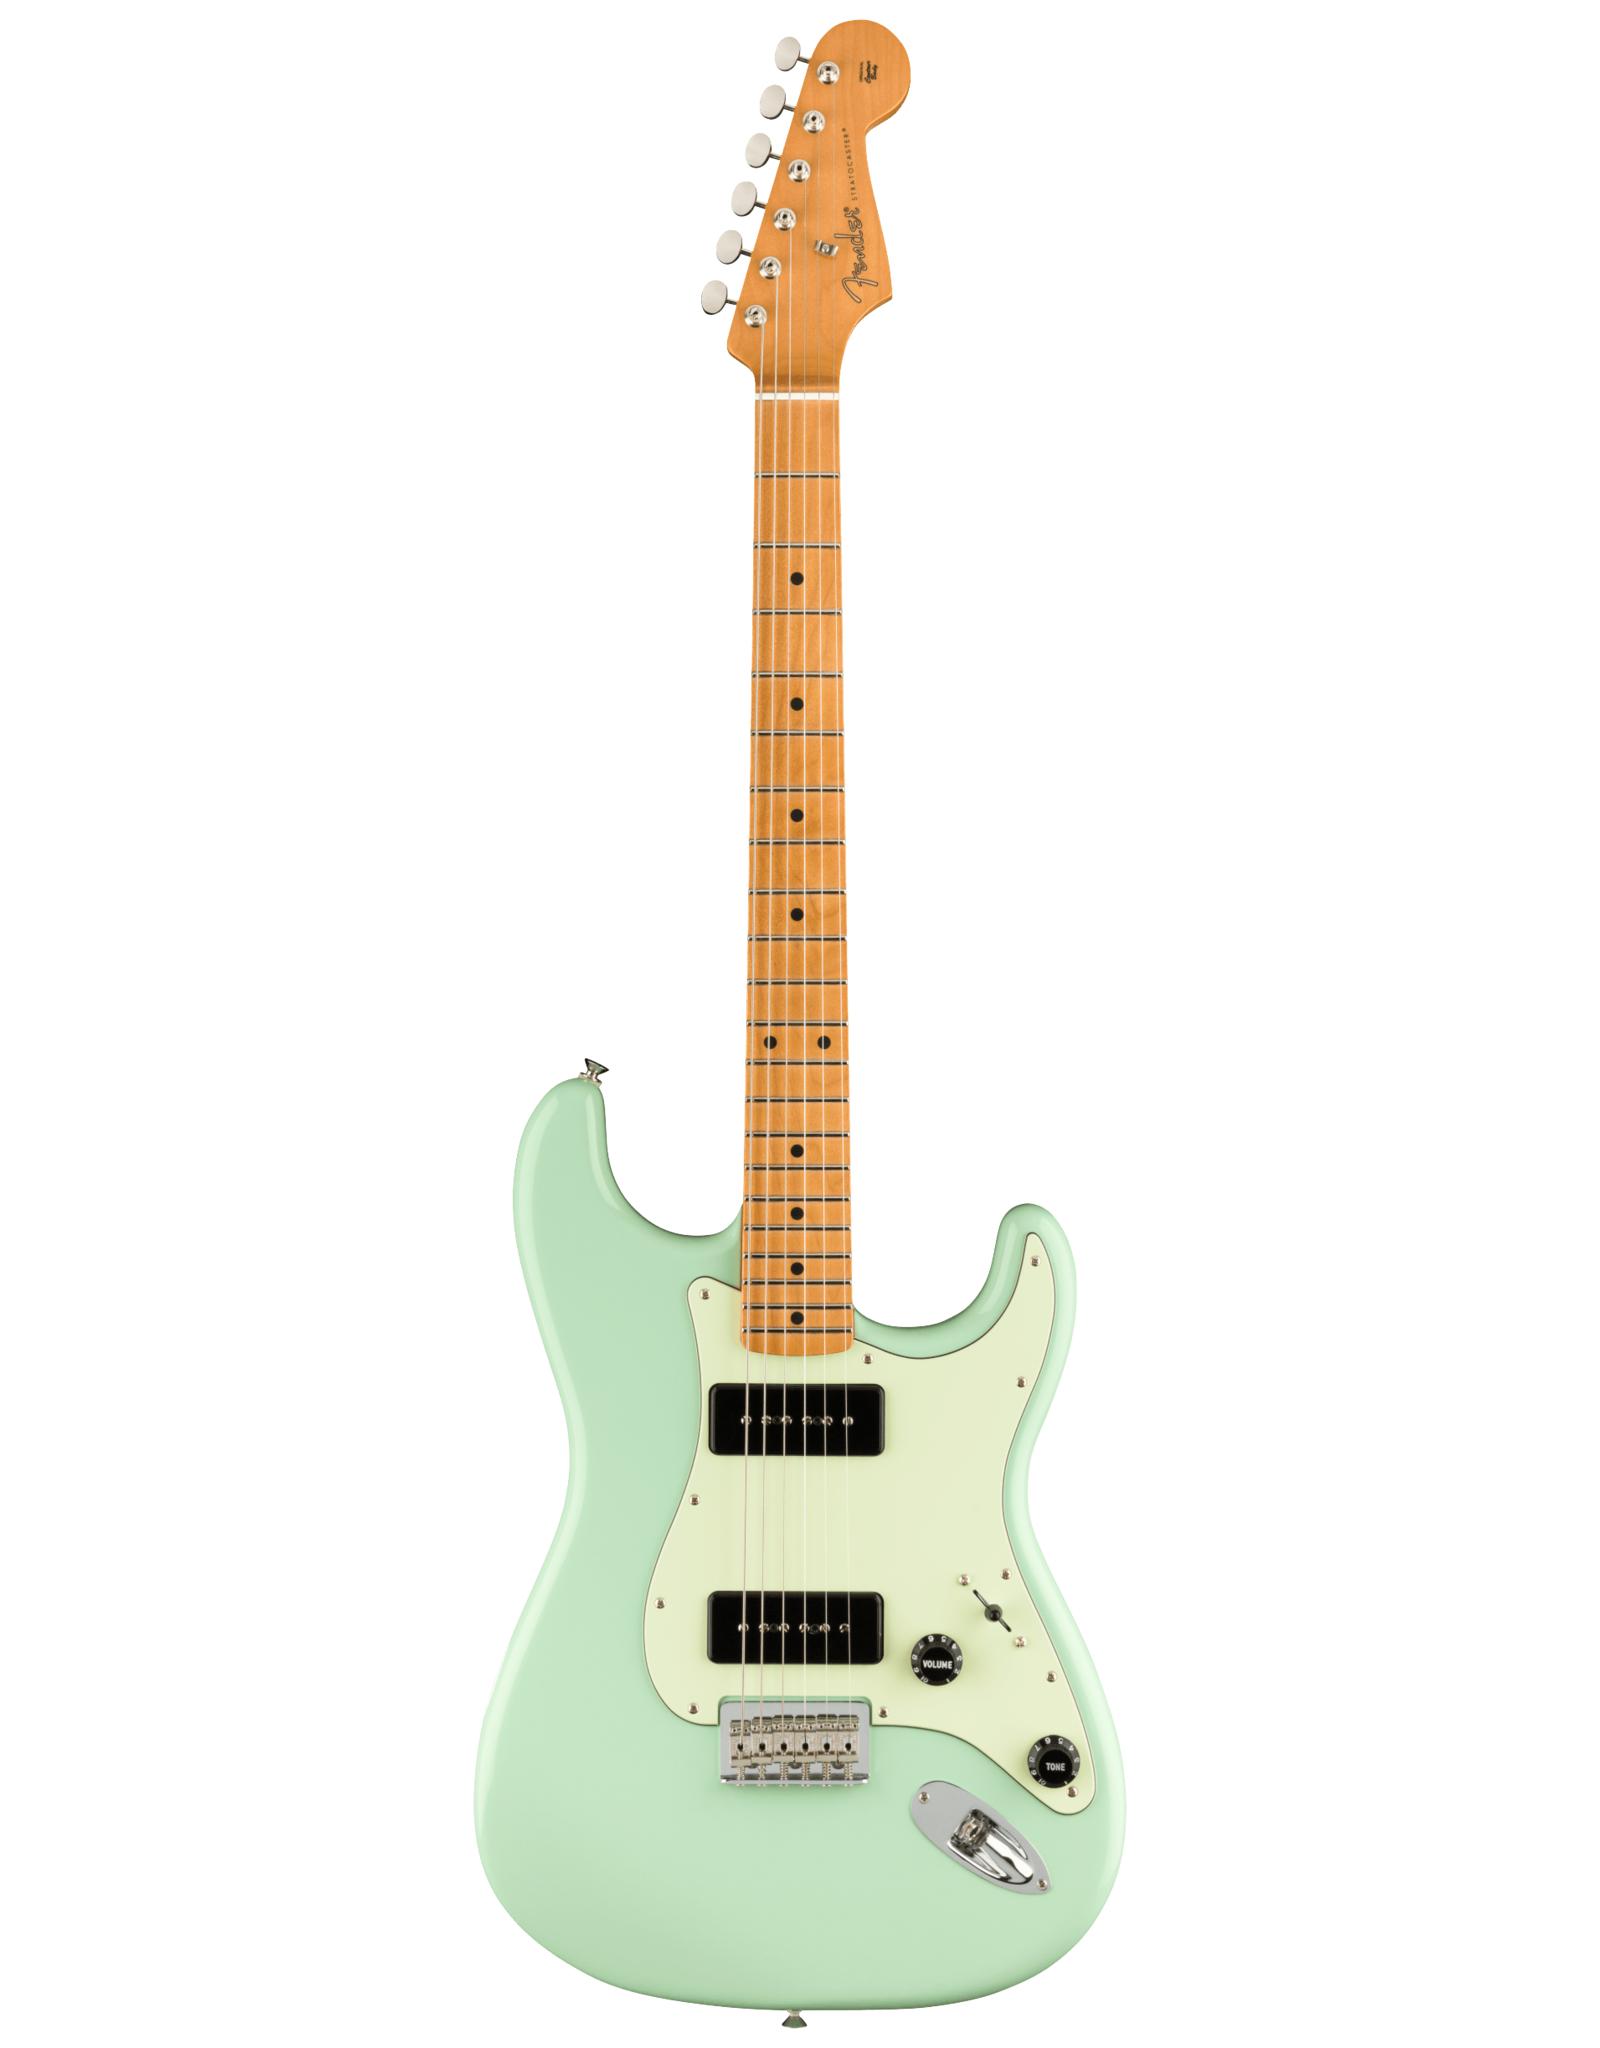 Fender Fender Noventa Stratocaster, Surf Green w/deluxe gig bag